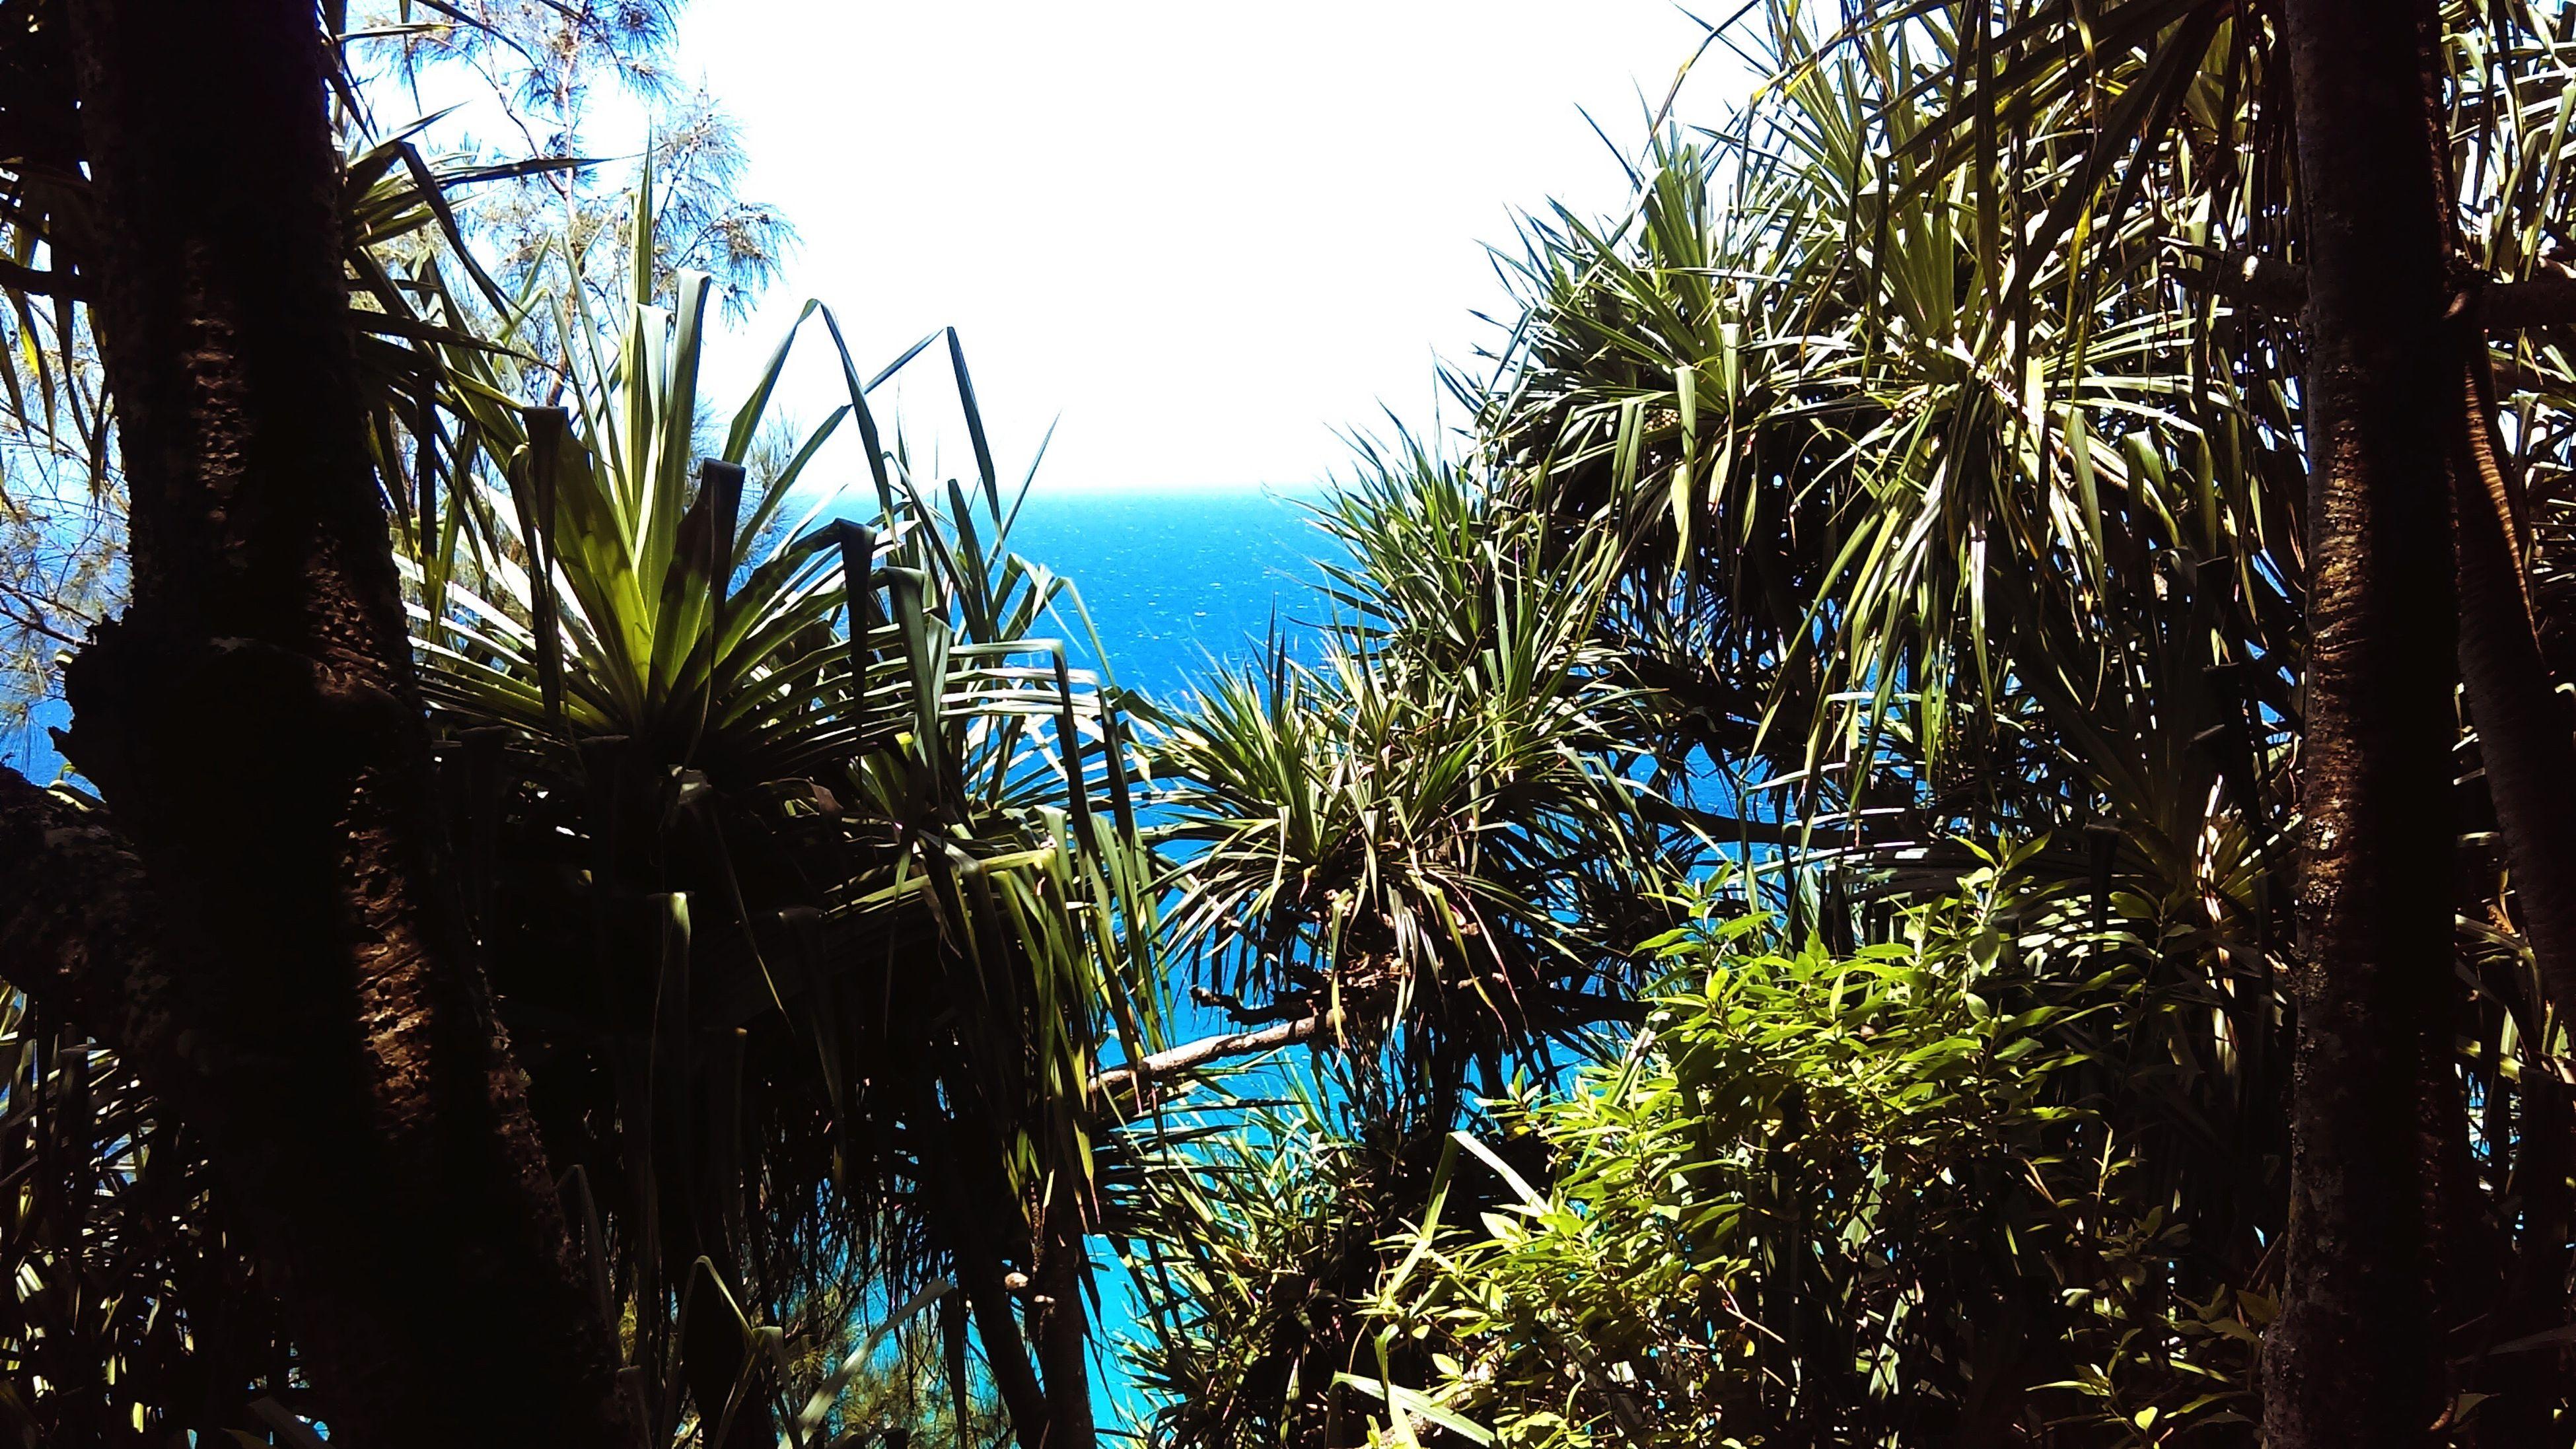 My Favorite Place Hawaii Napali Coast Ocean